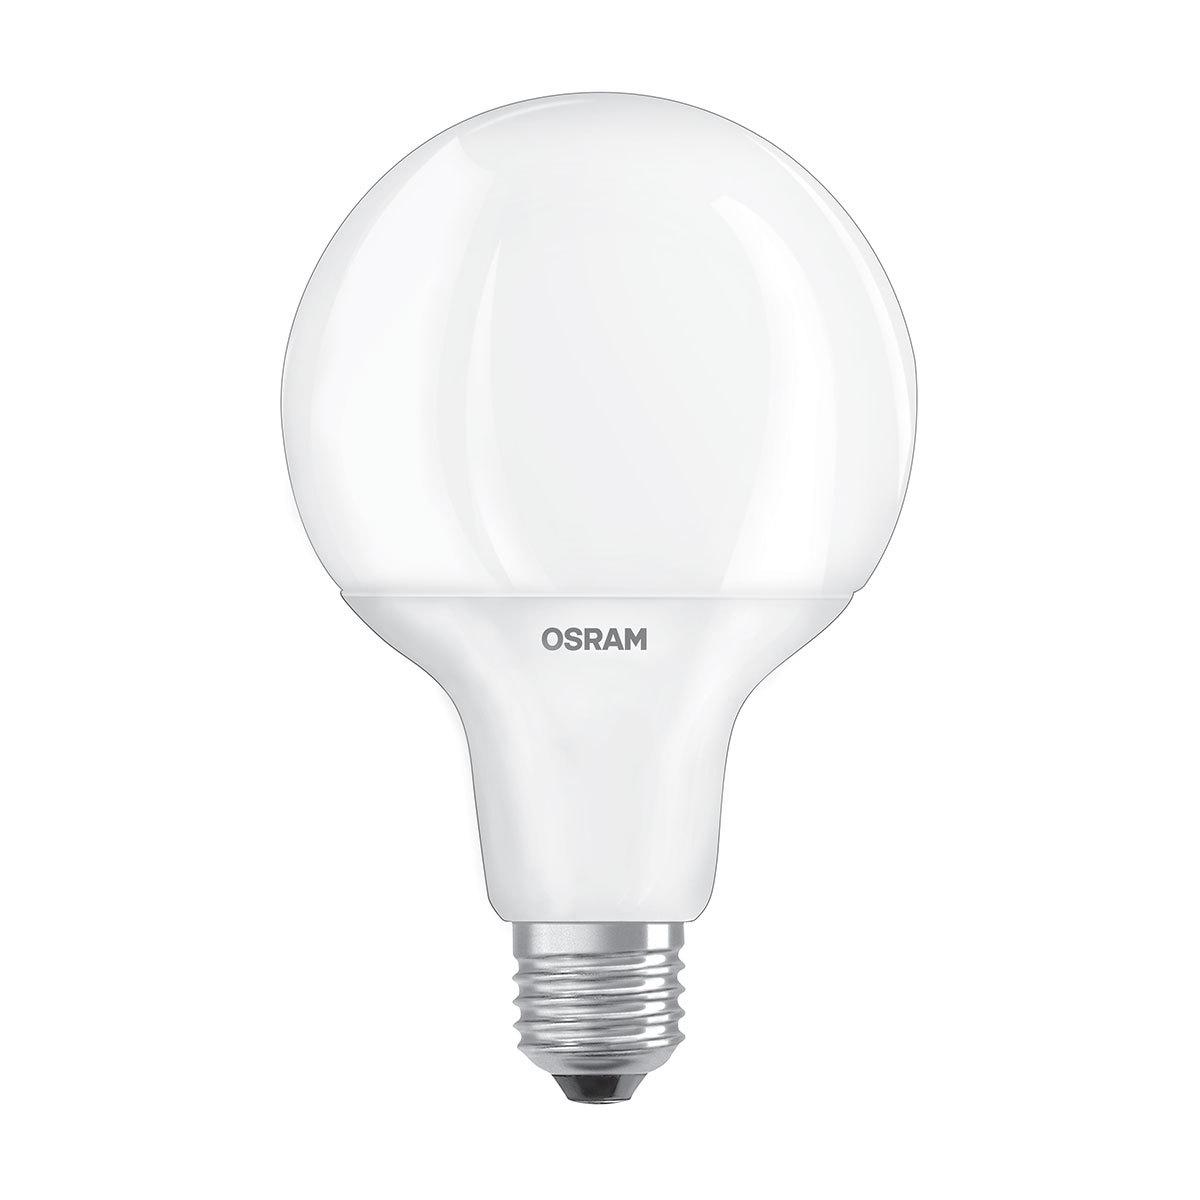 osram ampoule led superstar classic globe e27 9w 60w dimmable a ampoule led osram sur. Black Bedroom Furniture Sets. Home Design Ideas